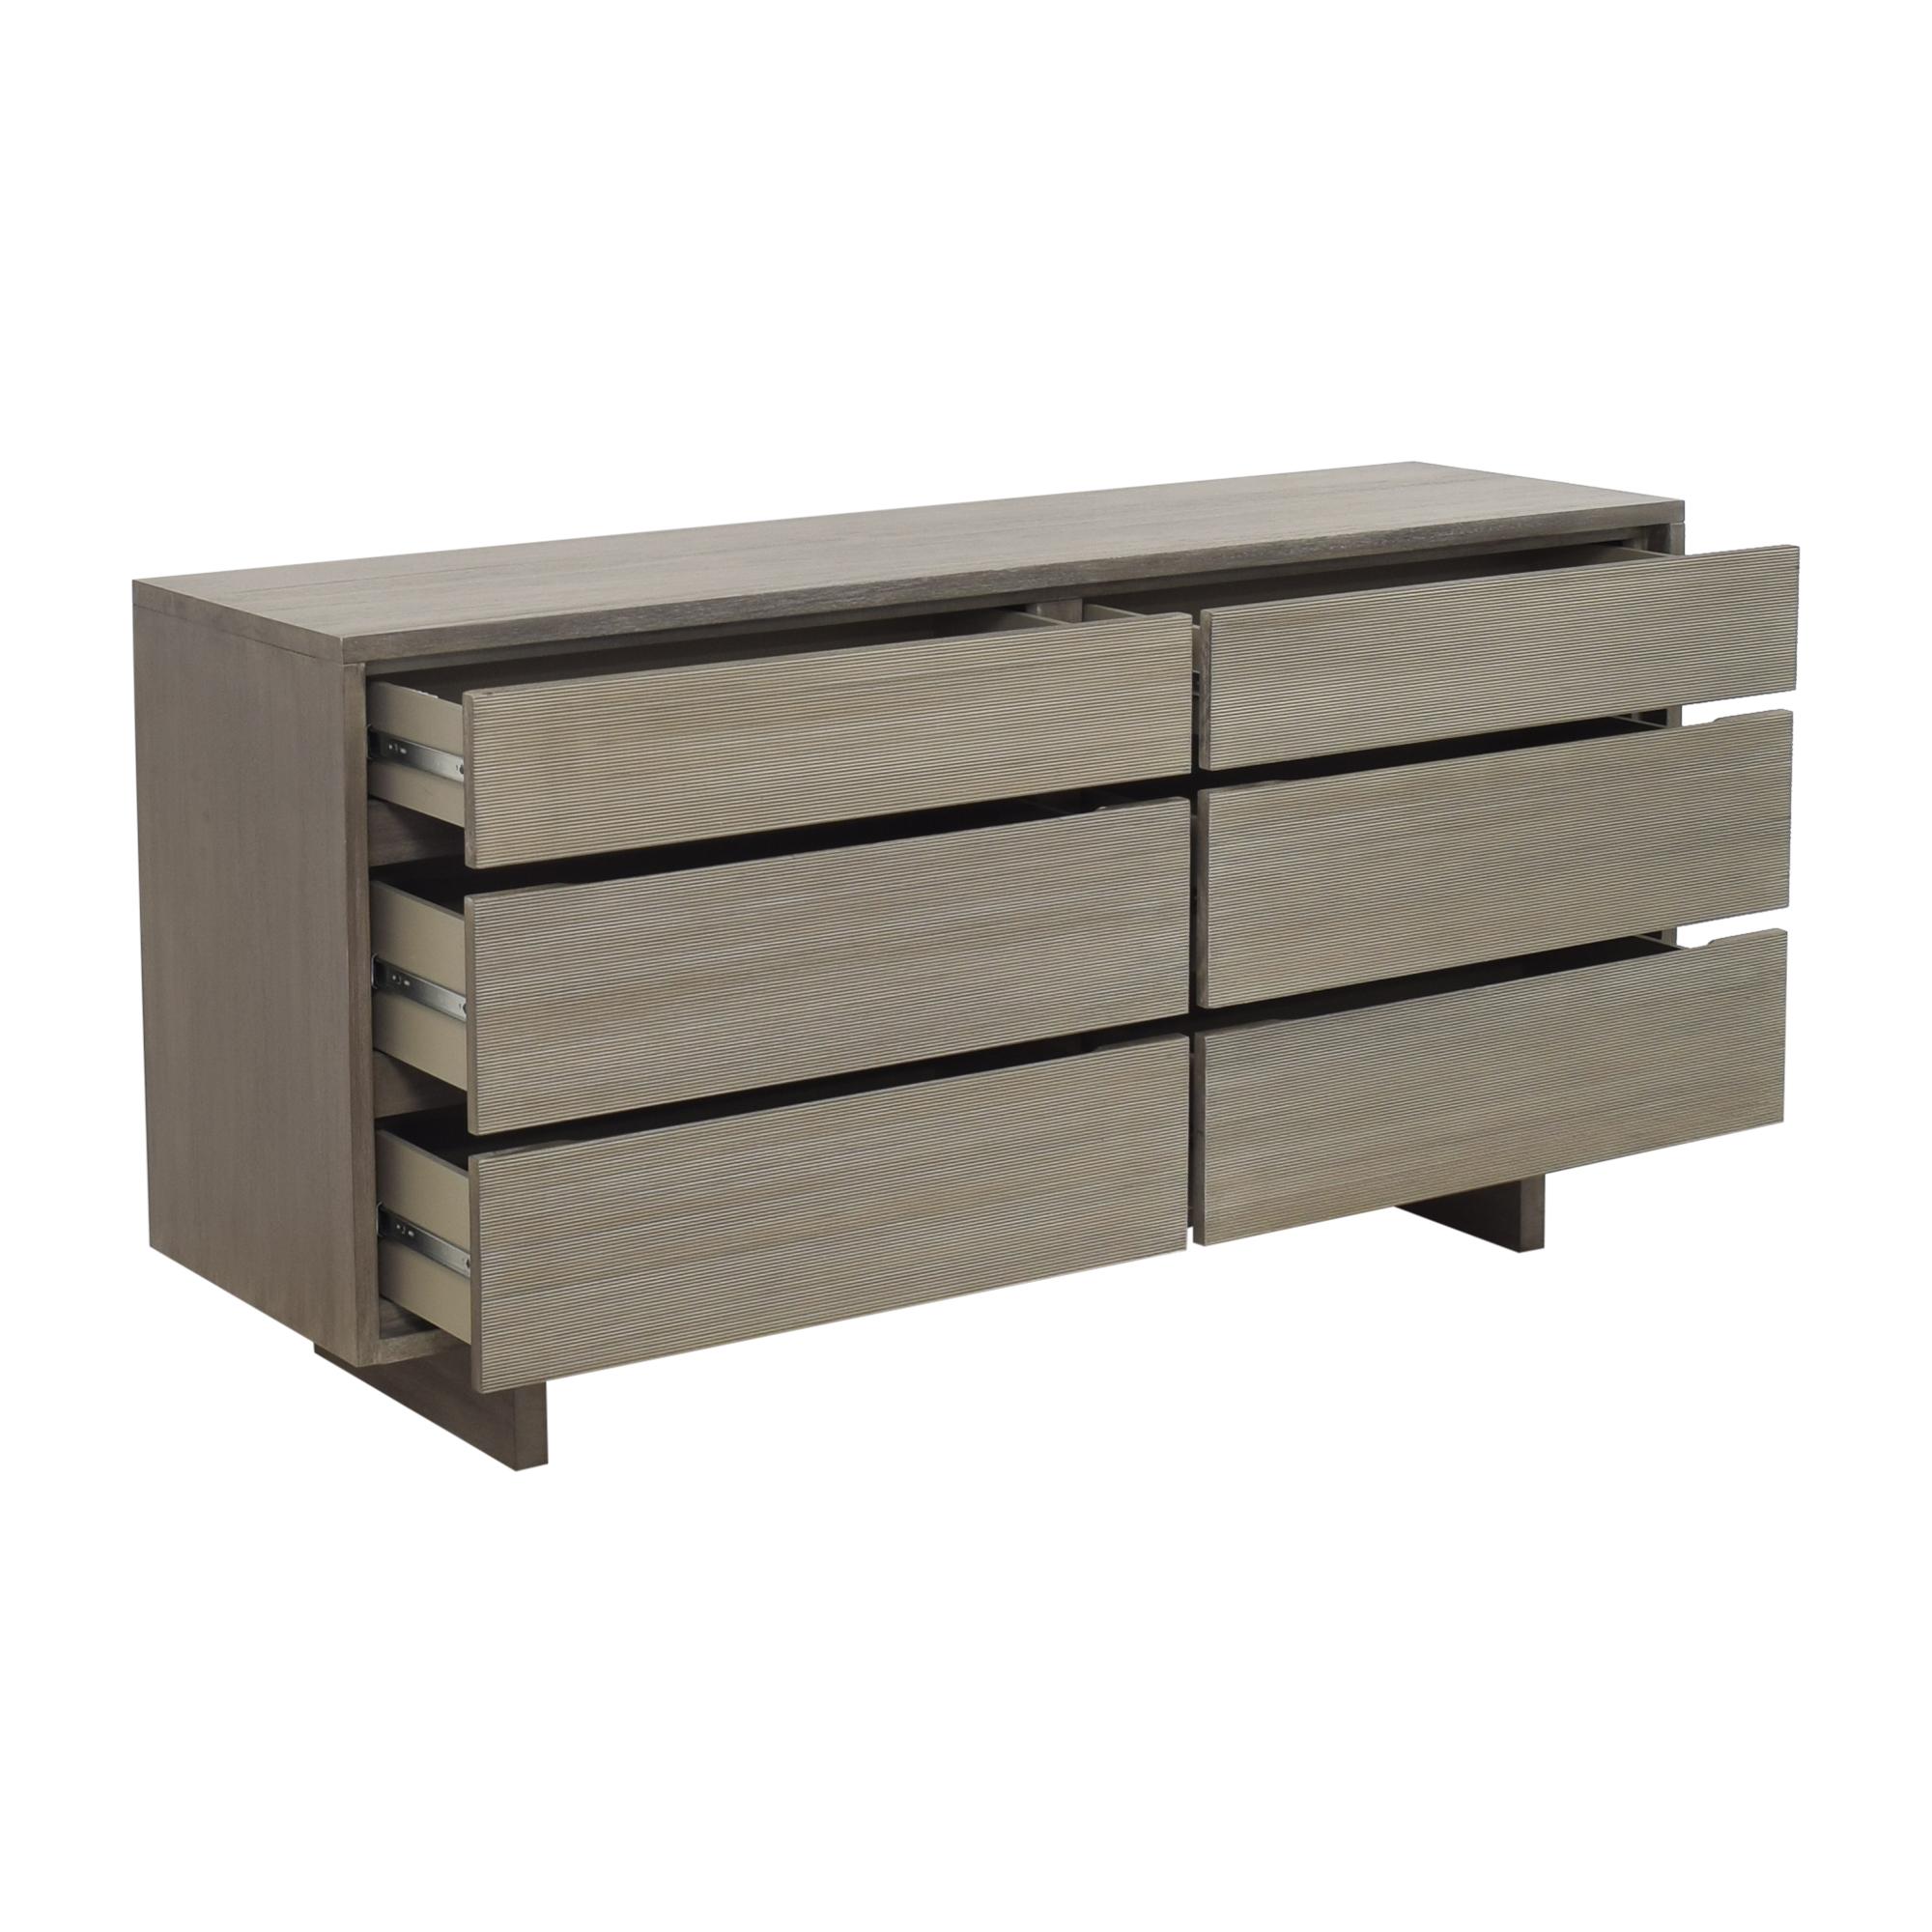 West Elm West Elm Arbor Textured Six Drawer Dresser grey